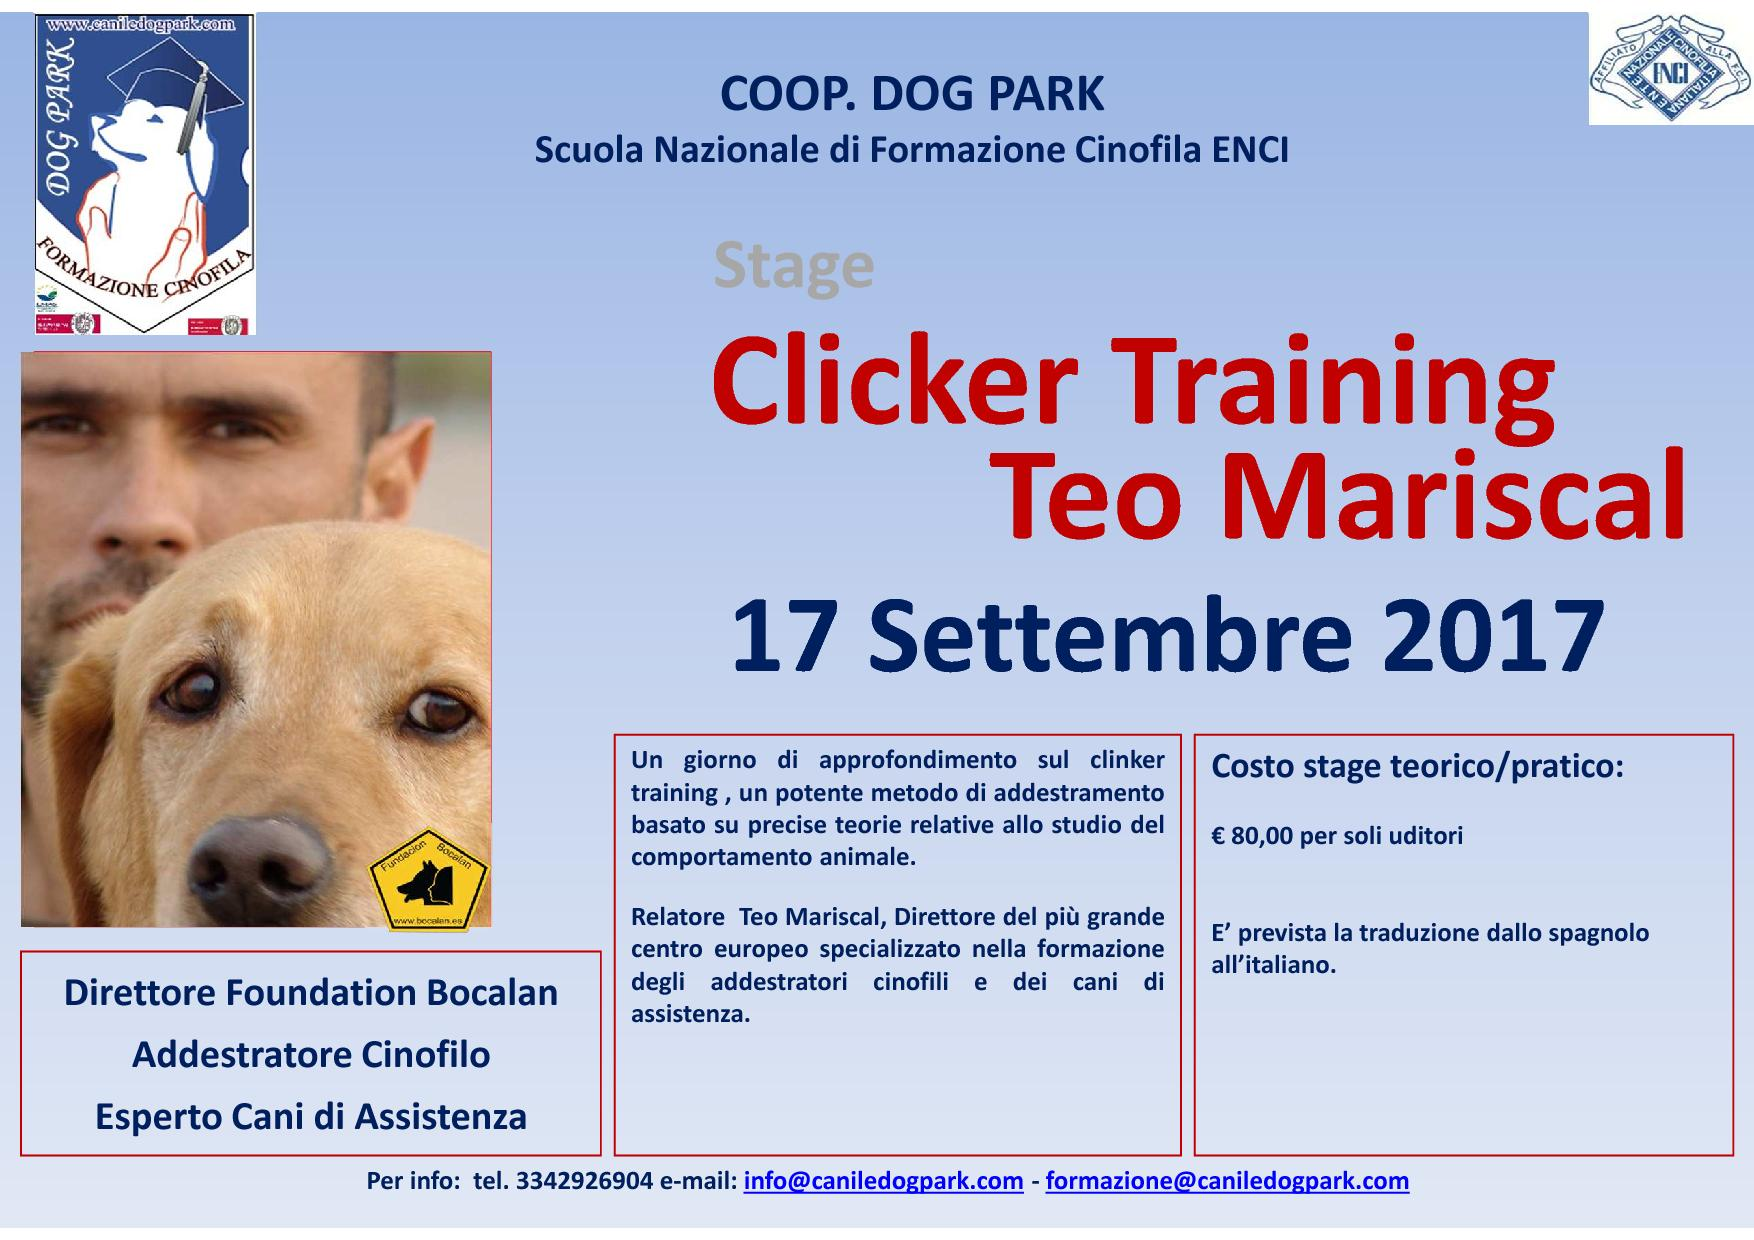 Clicker Training con Teo Mariscal